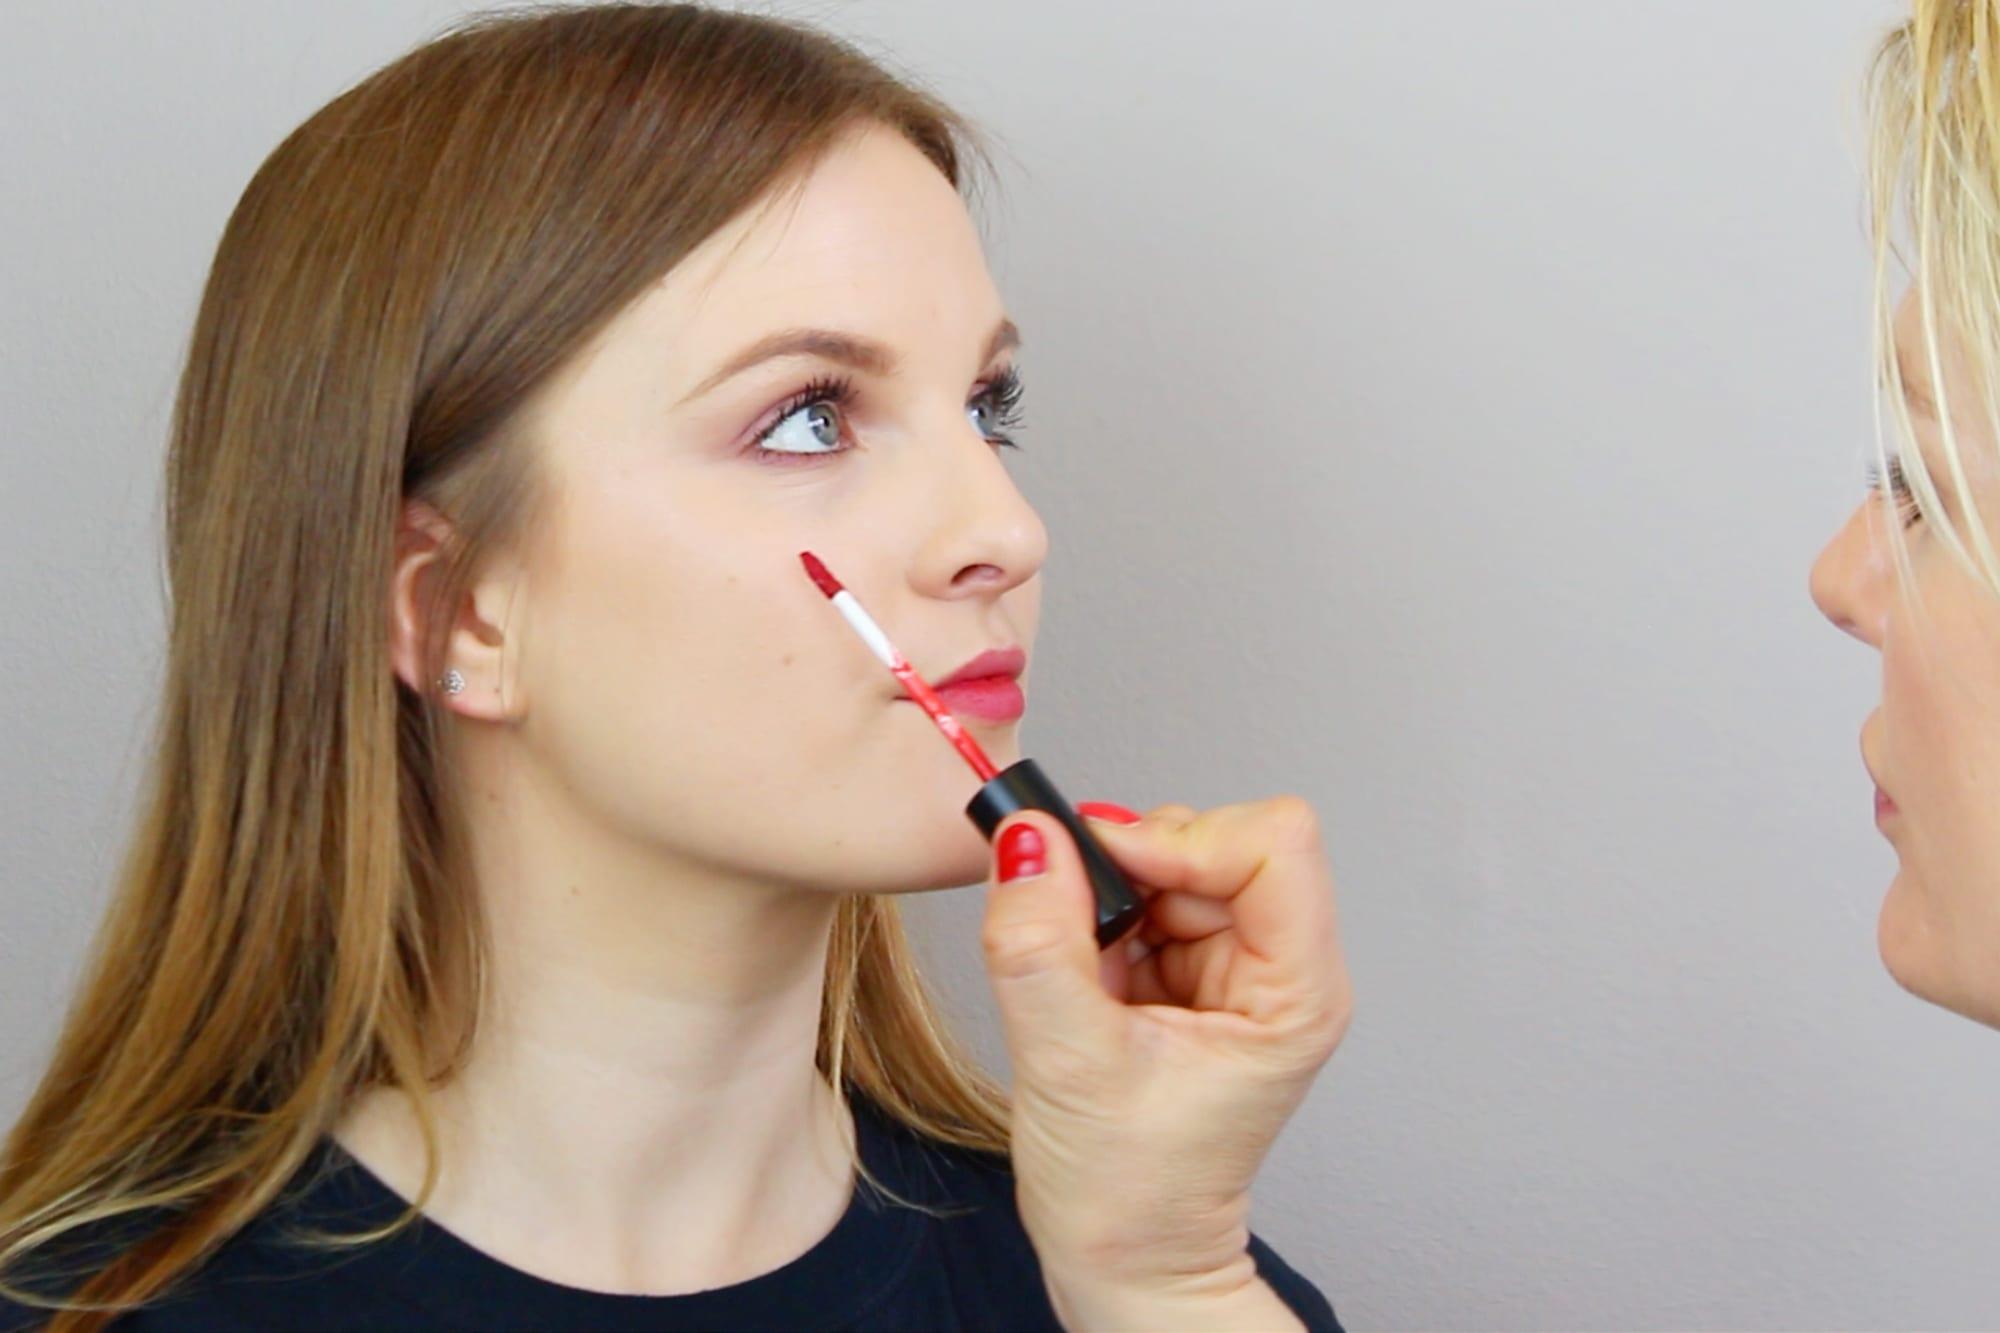 Beauty School: How To Apply Lip & Cheek Stain